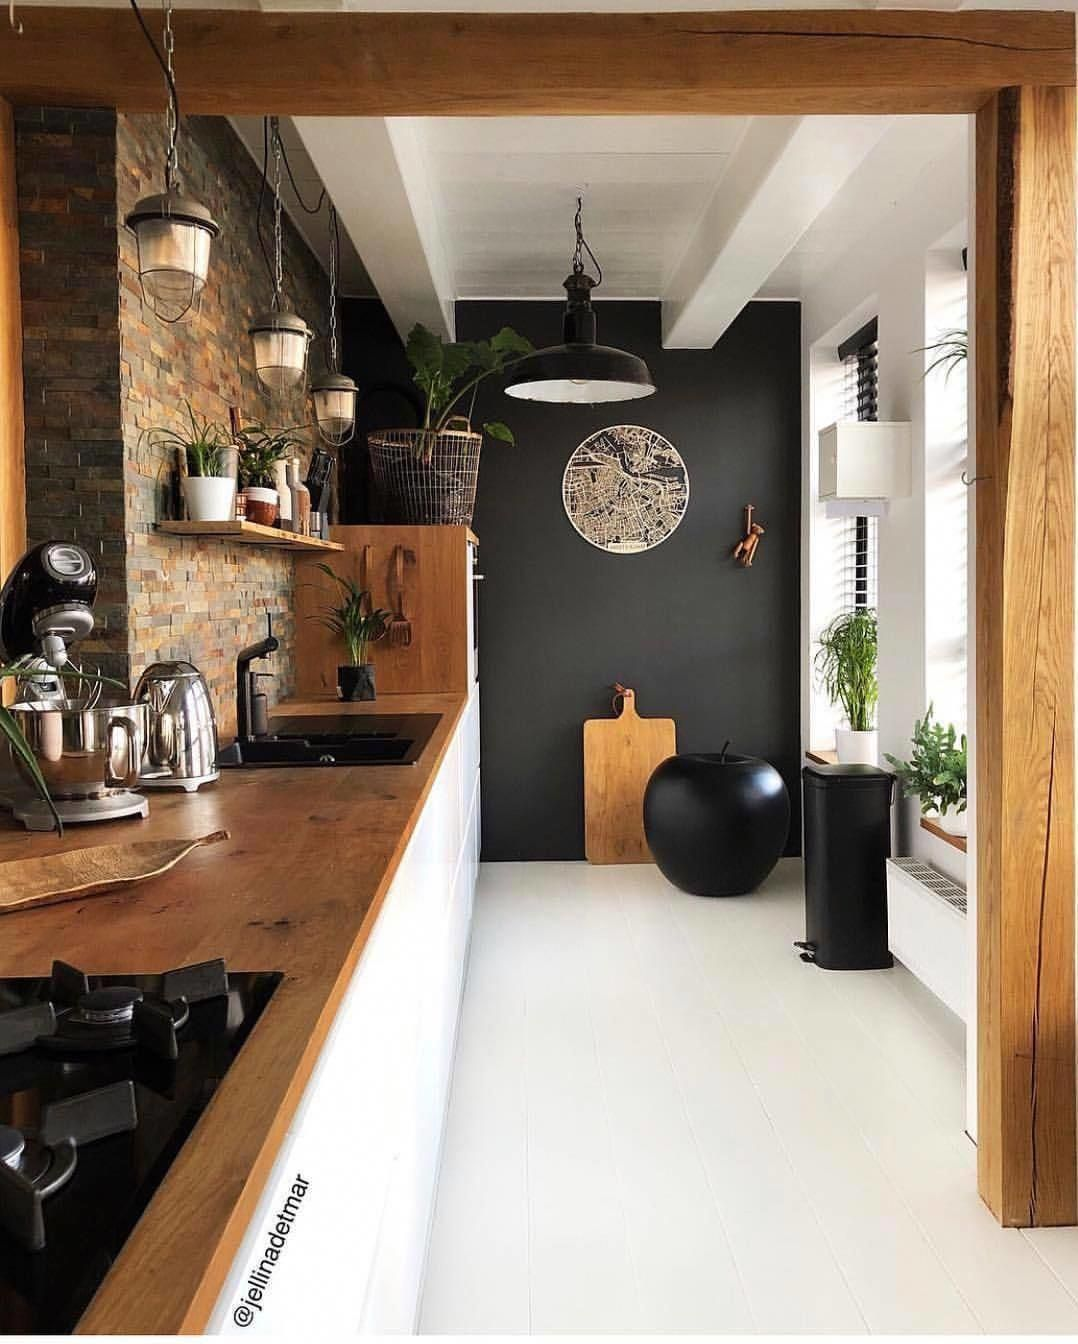 Cheap Home Decor Minimalist - SalePrice:34$ | Interior ...